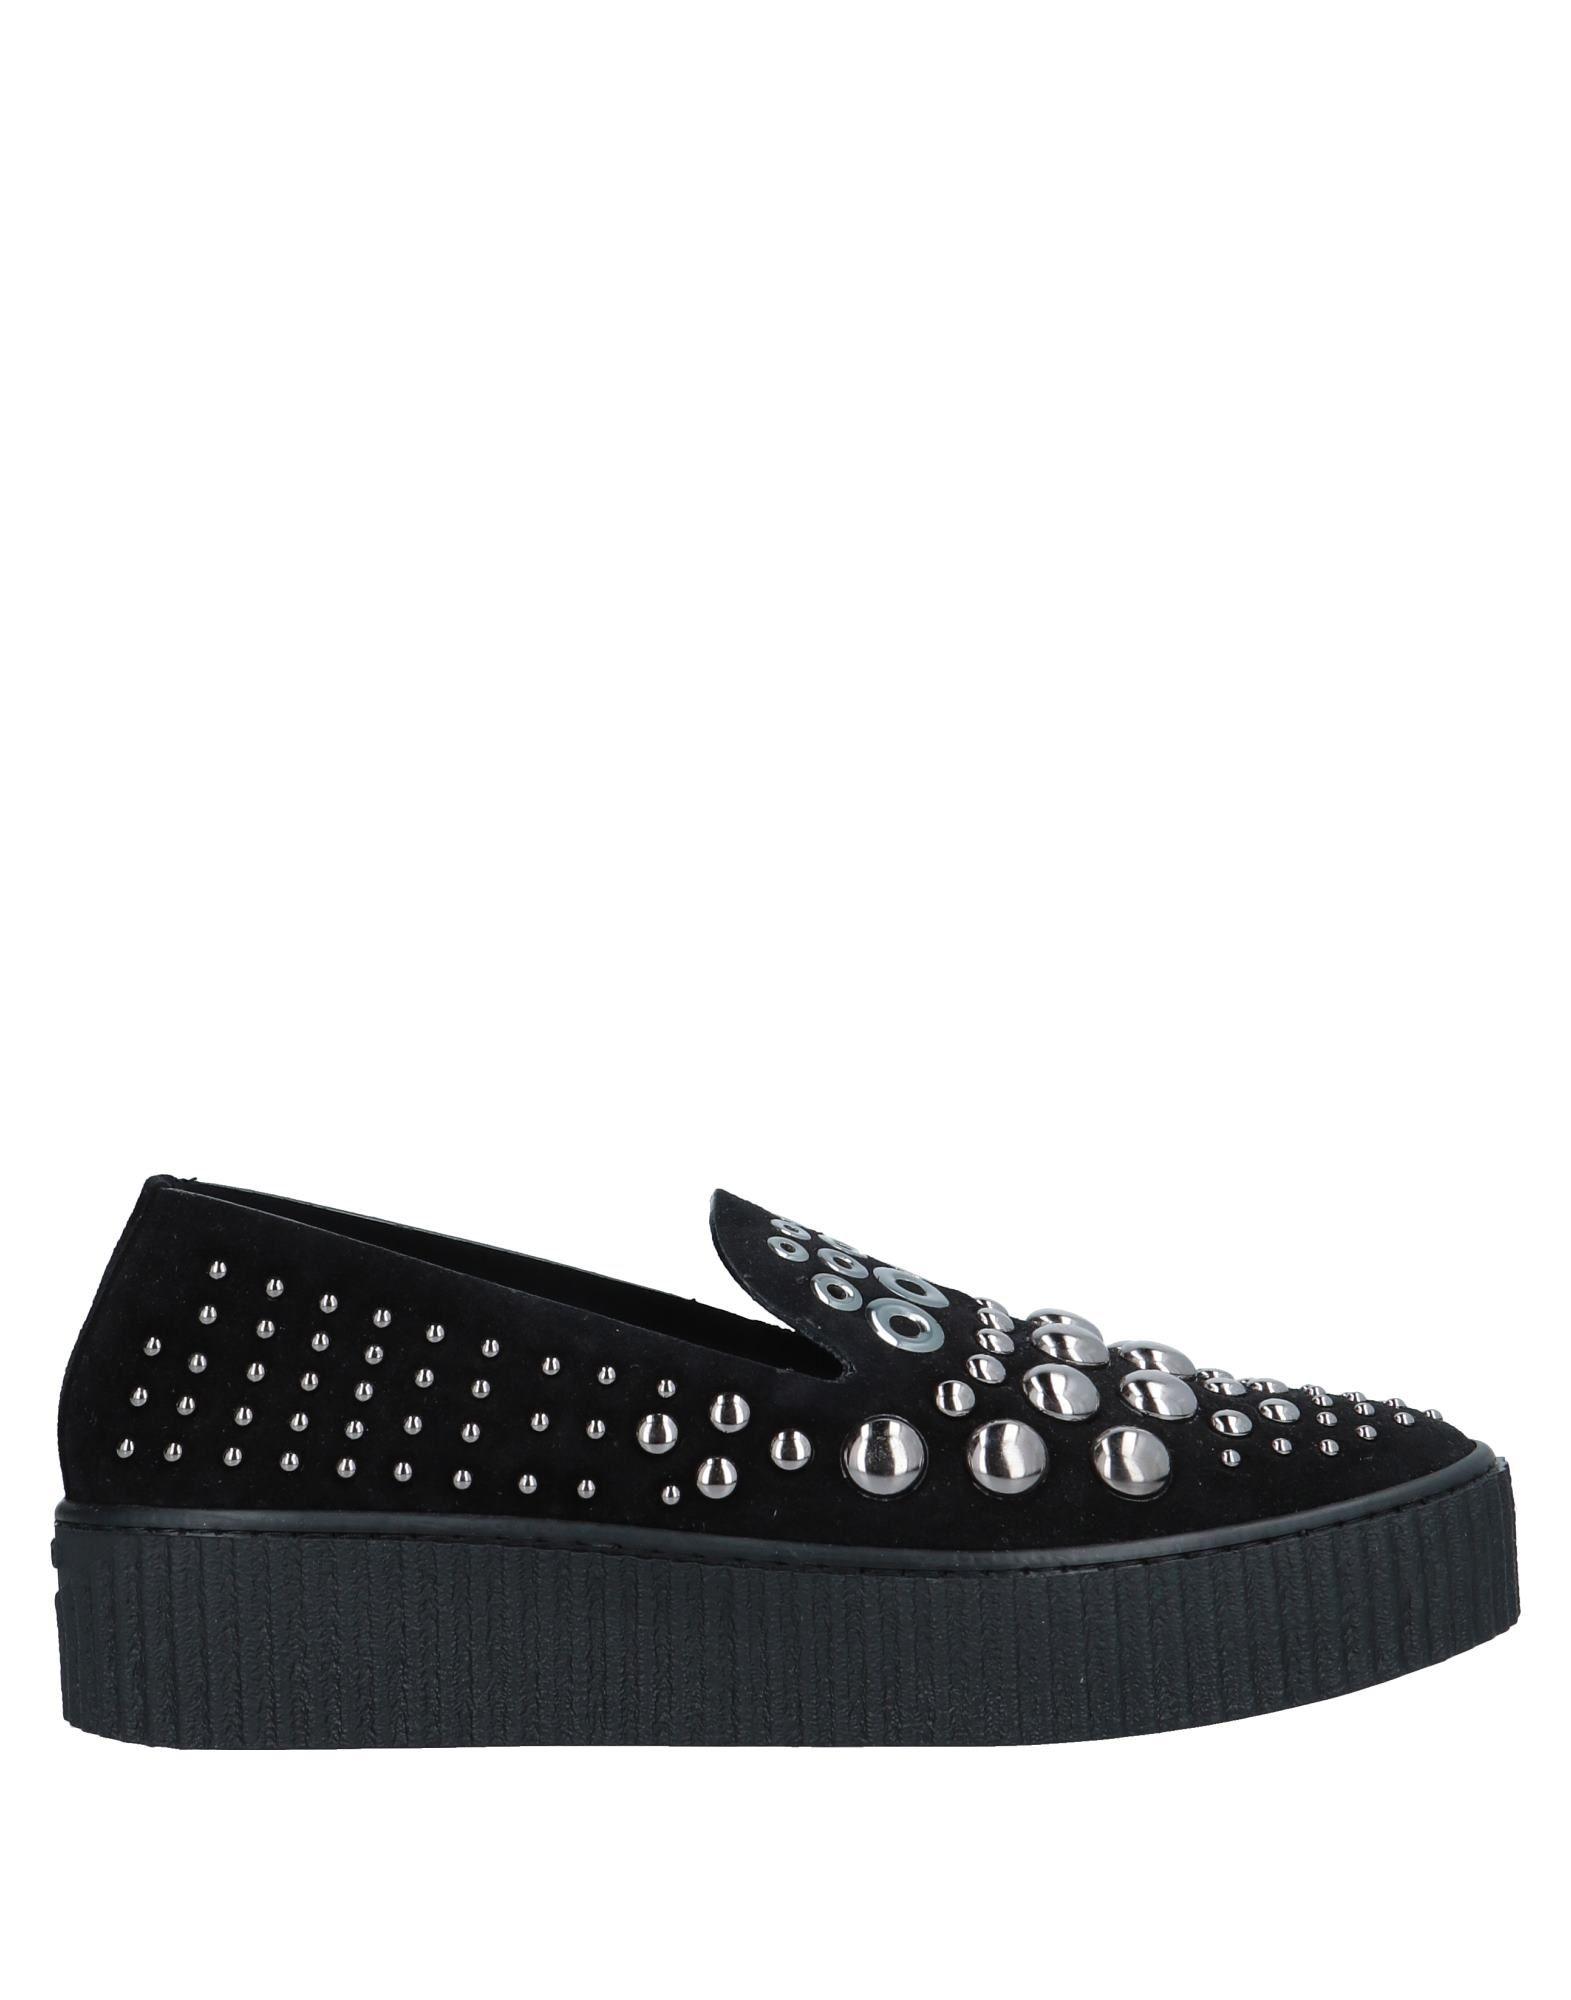 Stilvolle billige Schuhe 11568529JH Pinko Mokassins Damen  11568529JH Schuhe 6eda47